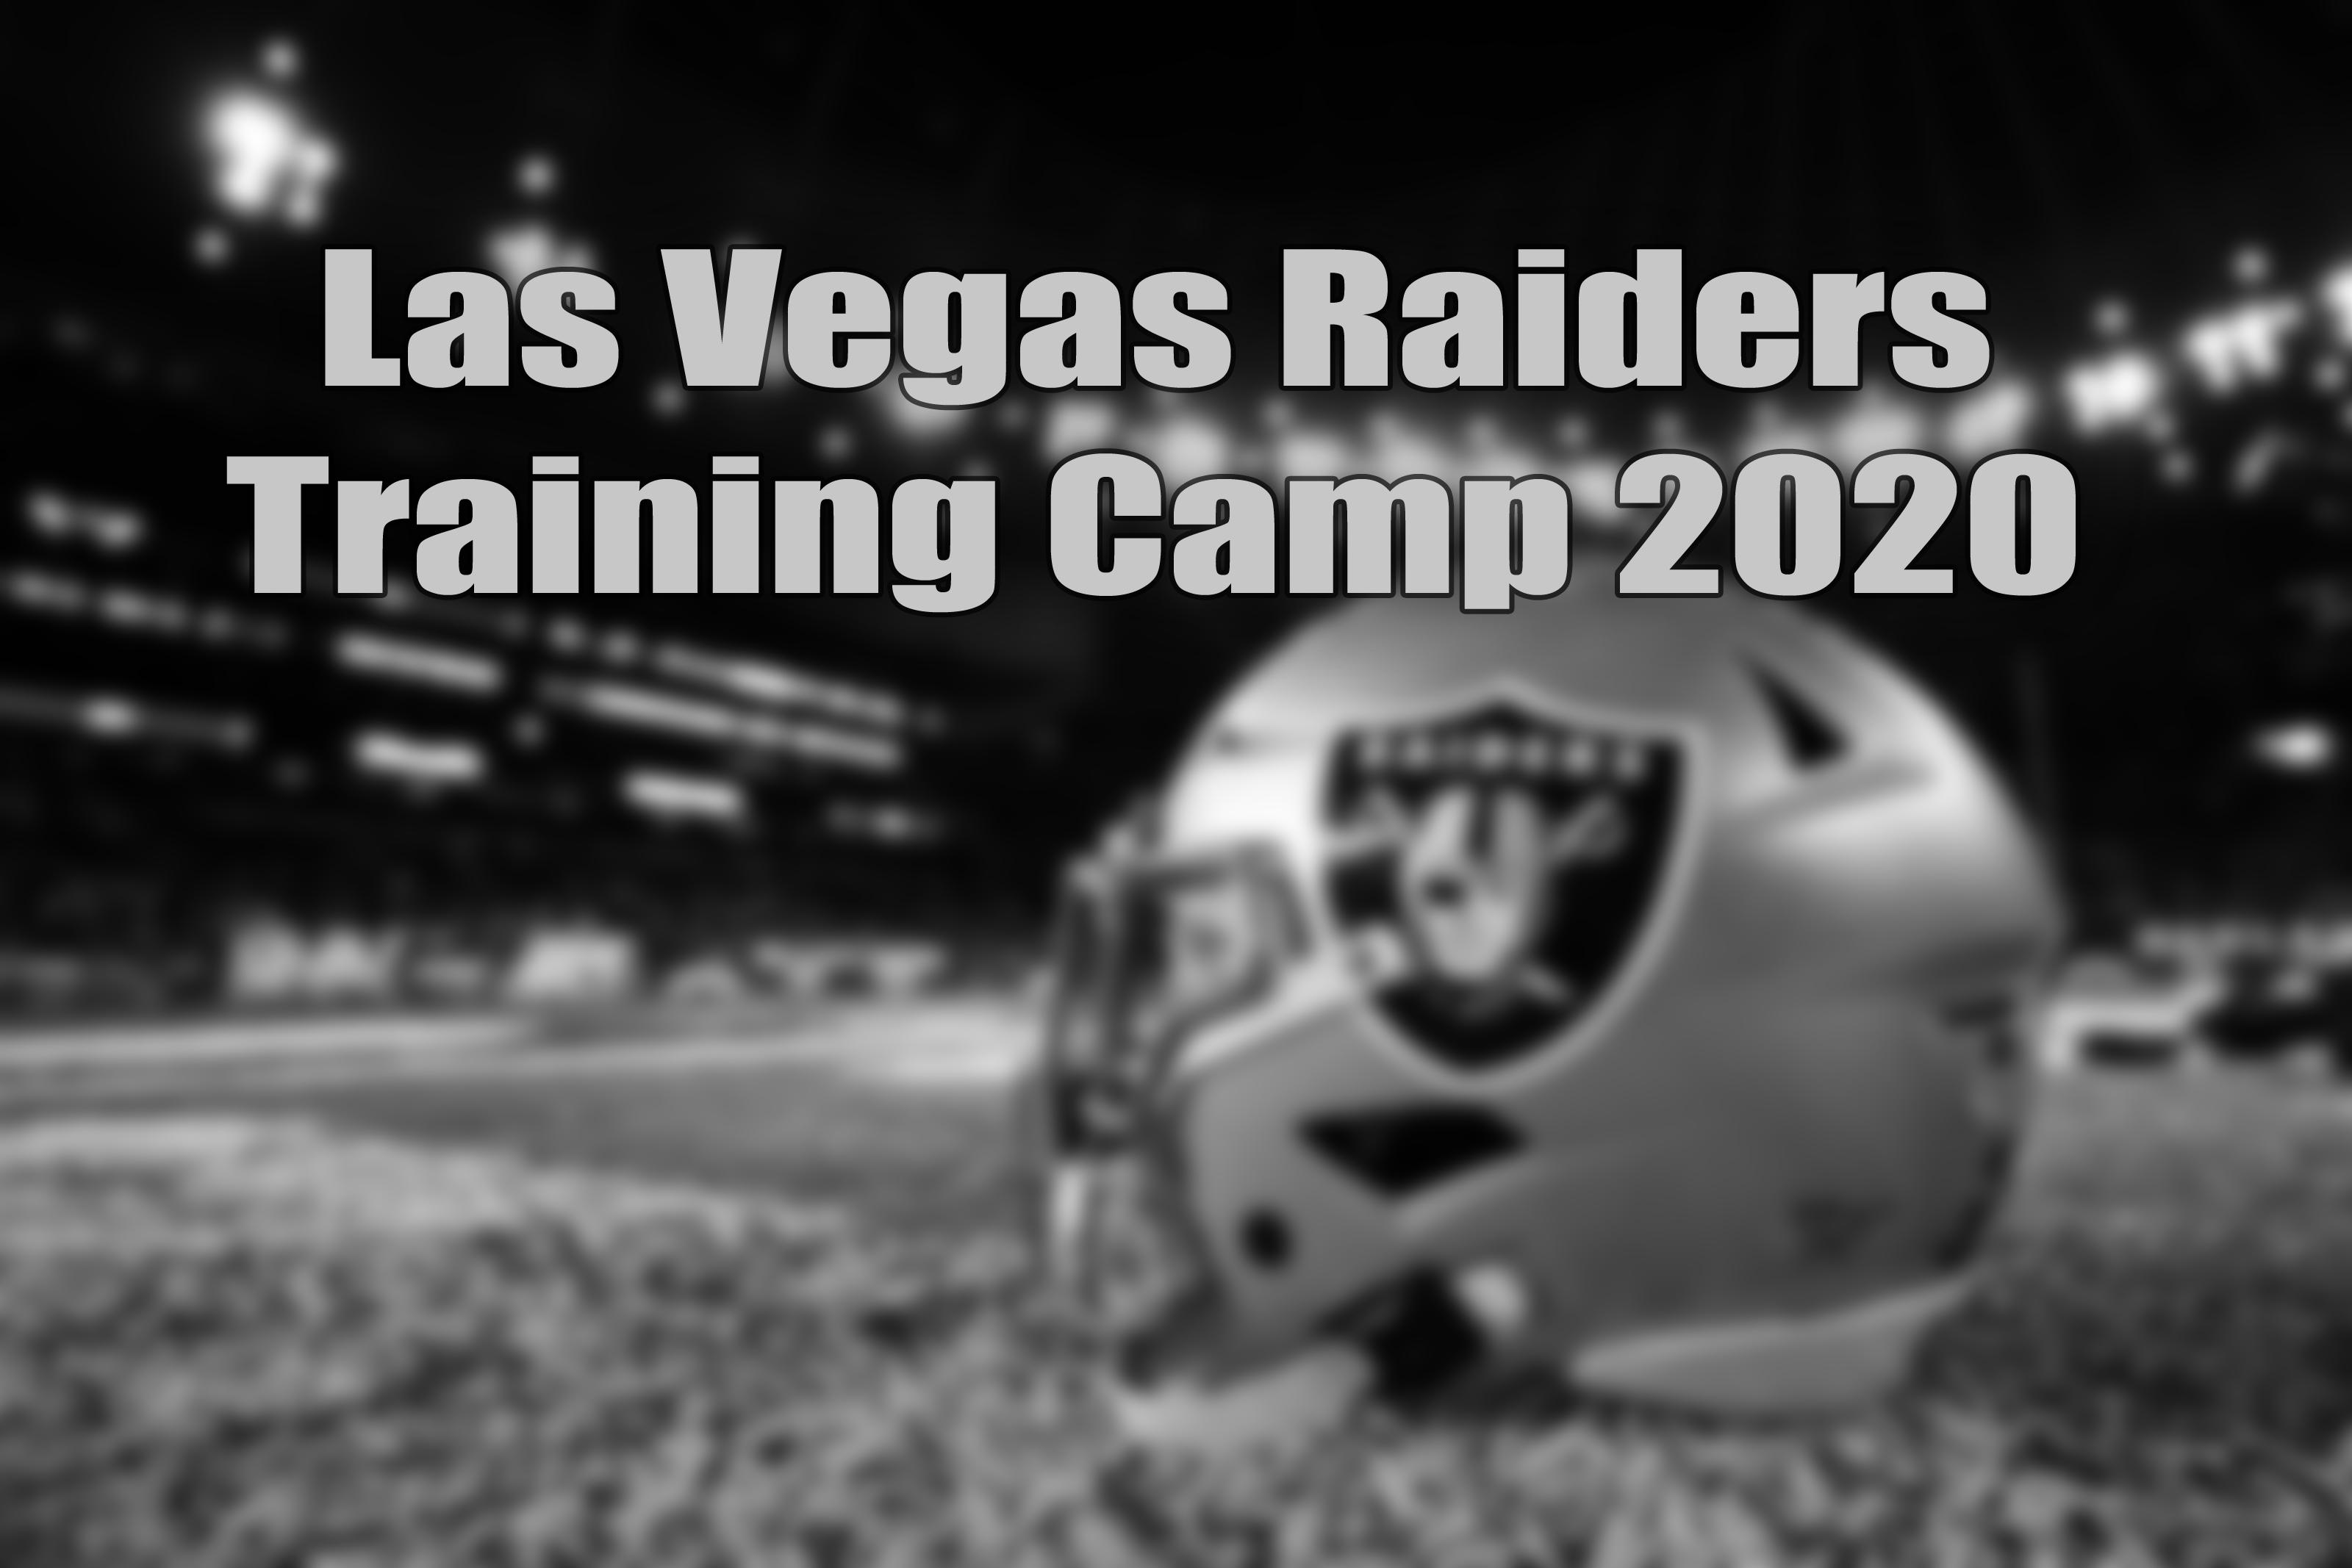 Raiders Las Vegas Training Camp.jpg